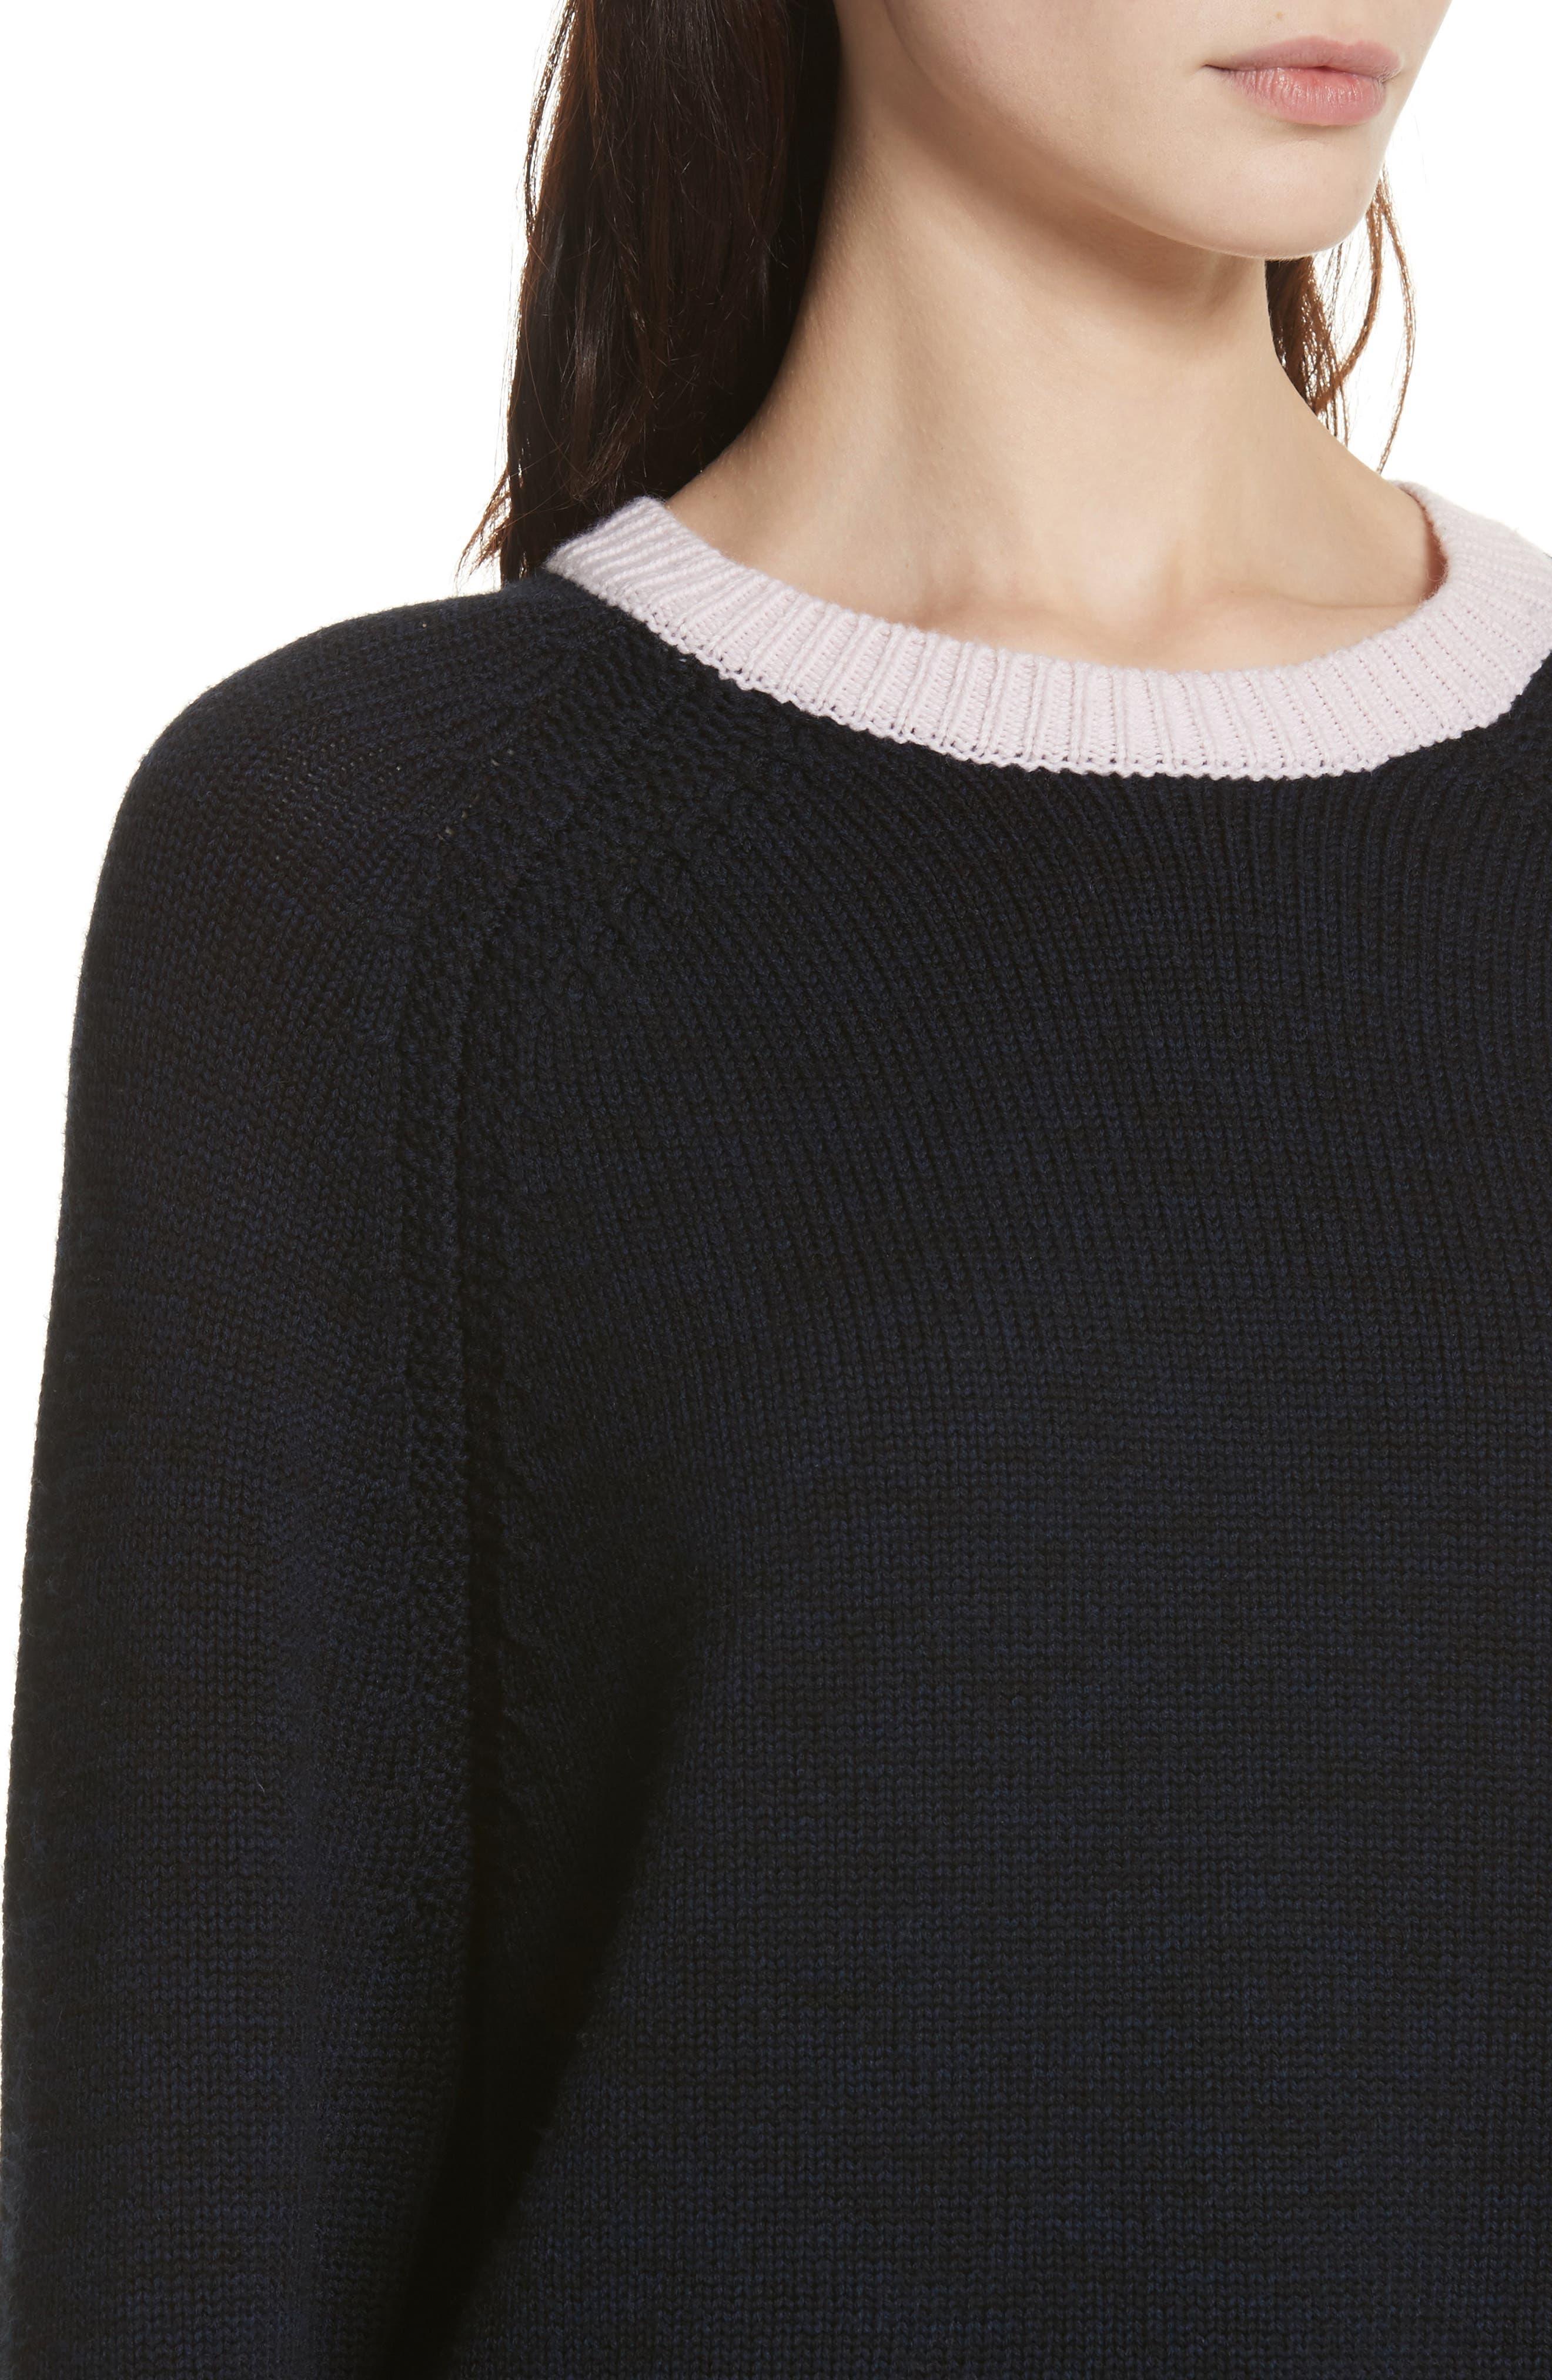 Hattie Crewneck Merino Wool Sweater,                             Alternate thumbnail 4, color,                             Navy